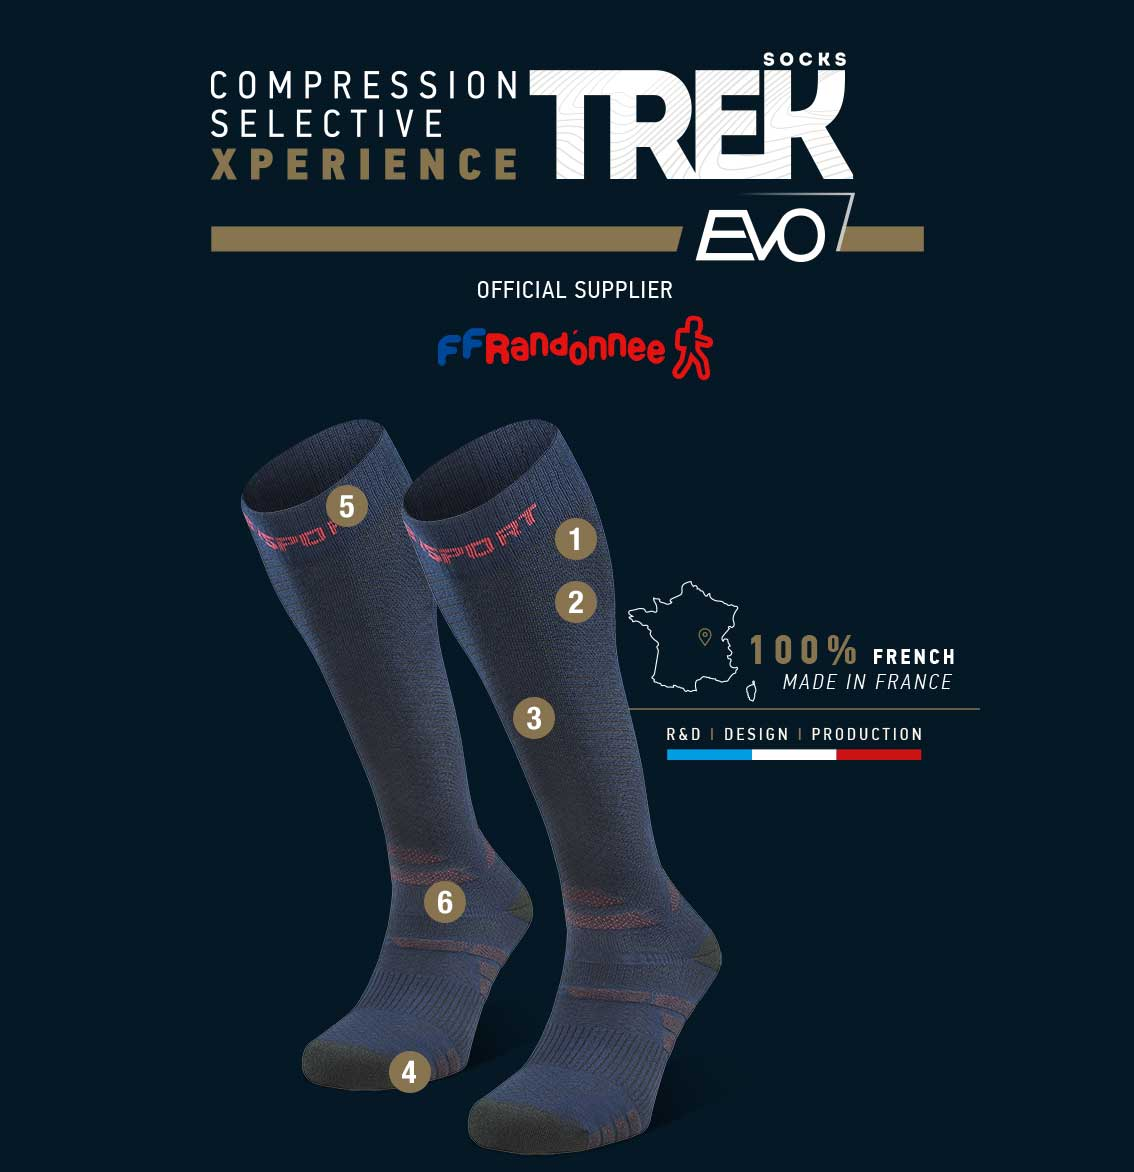 Hiking_socks_Trek_compression_EVO_blue-red